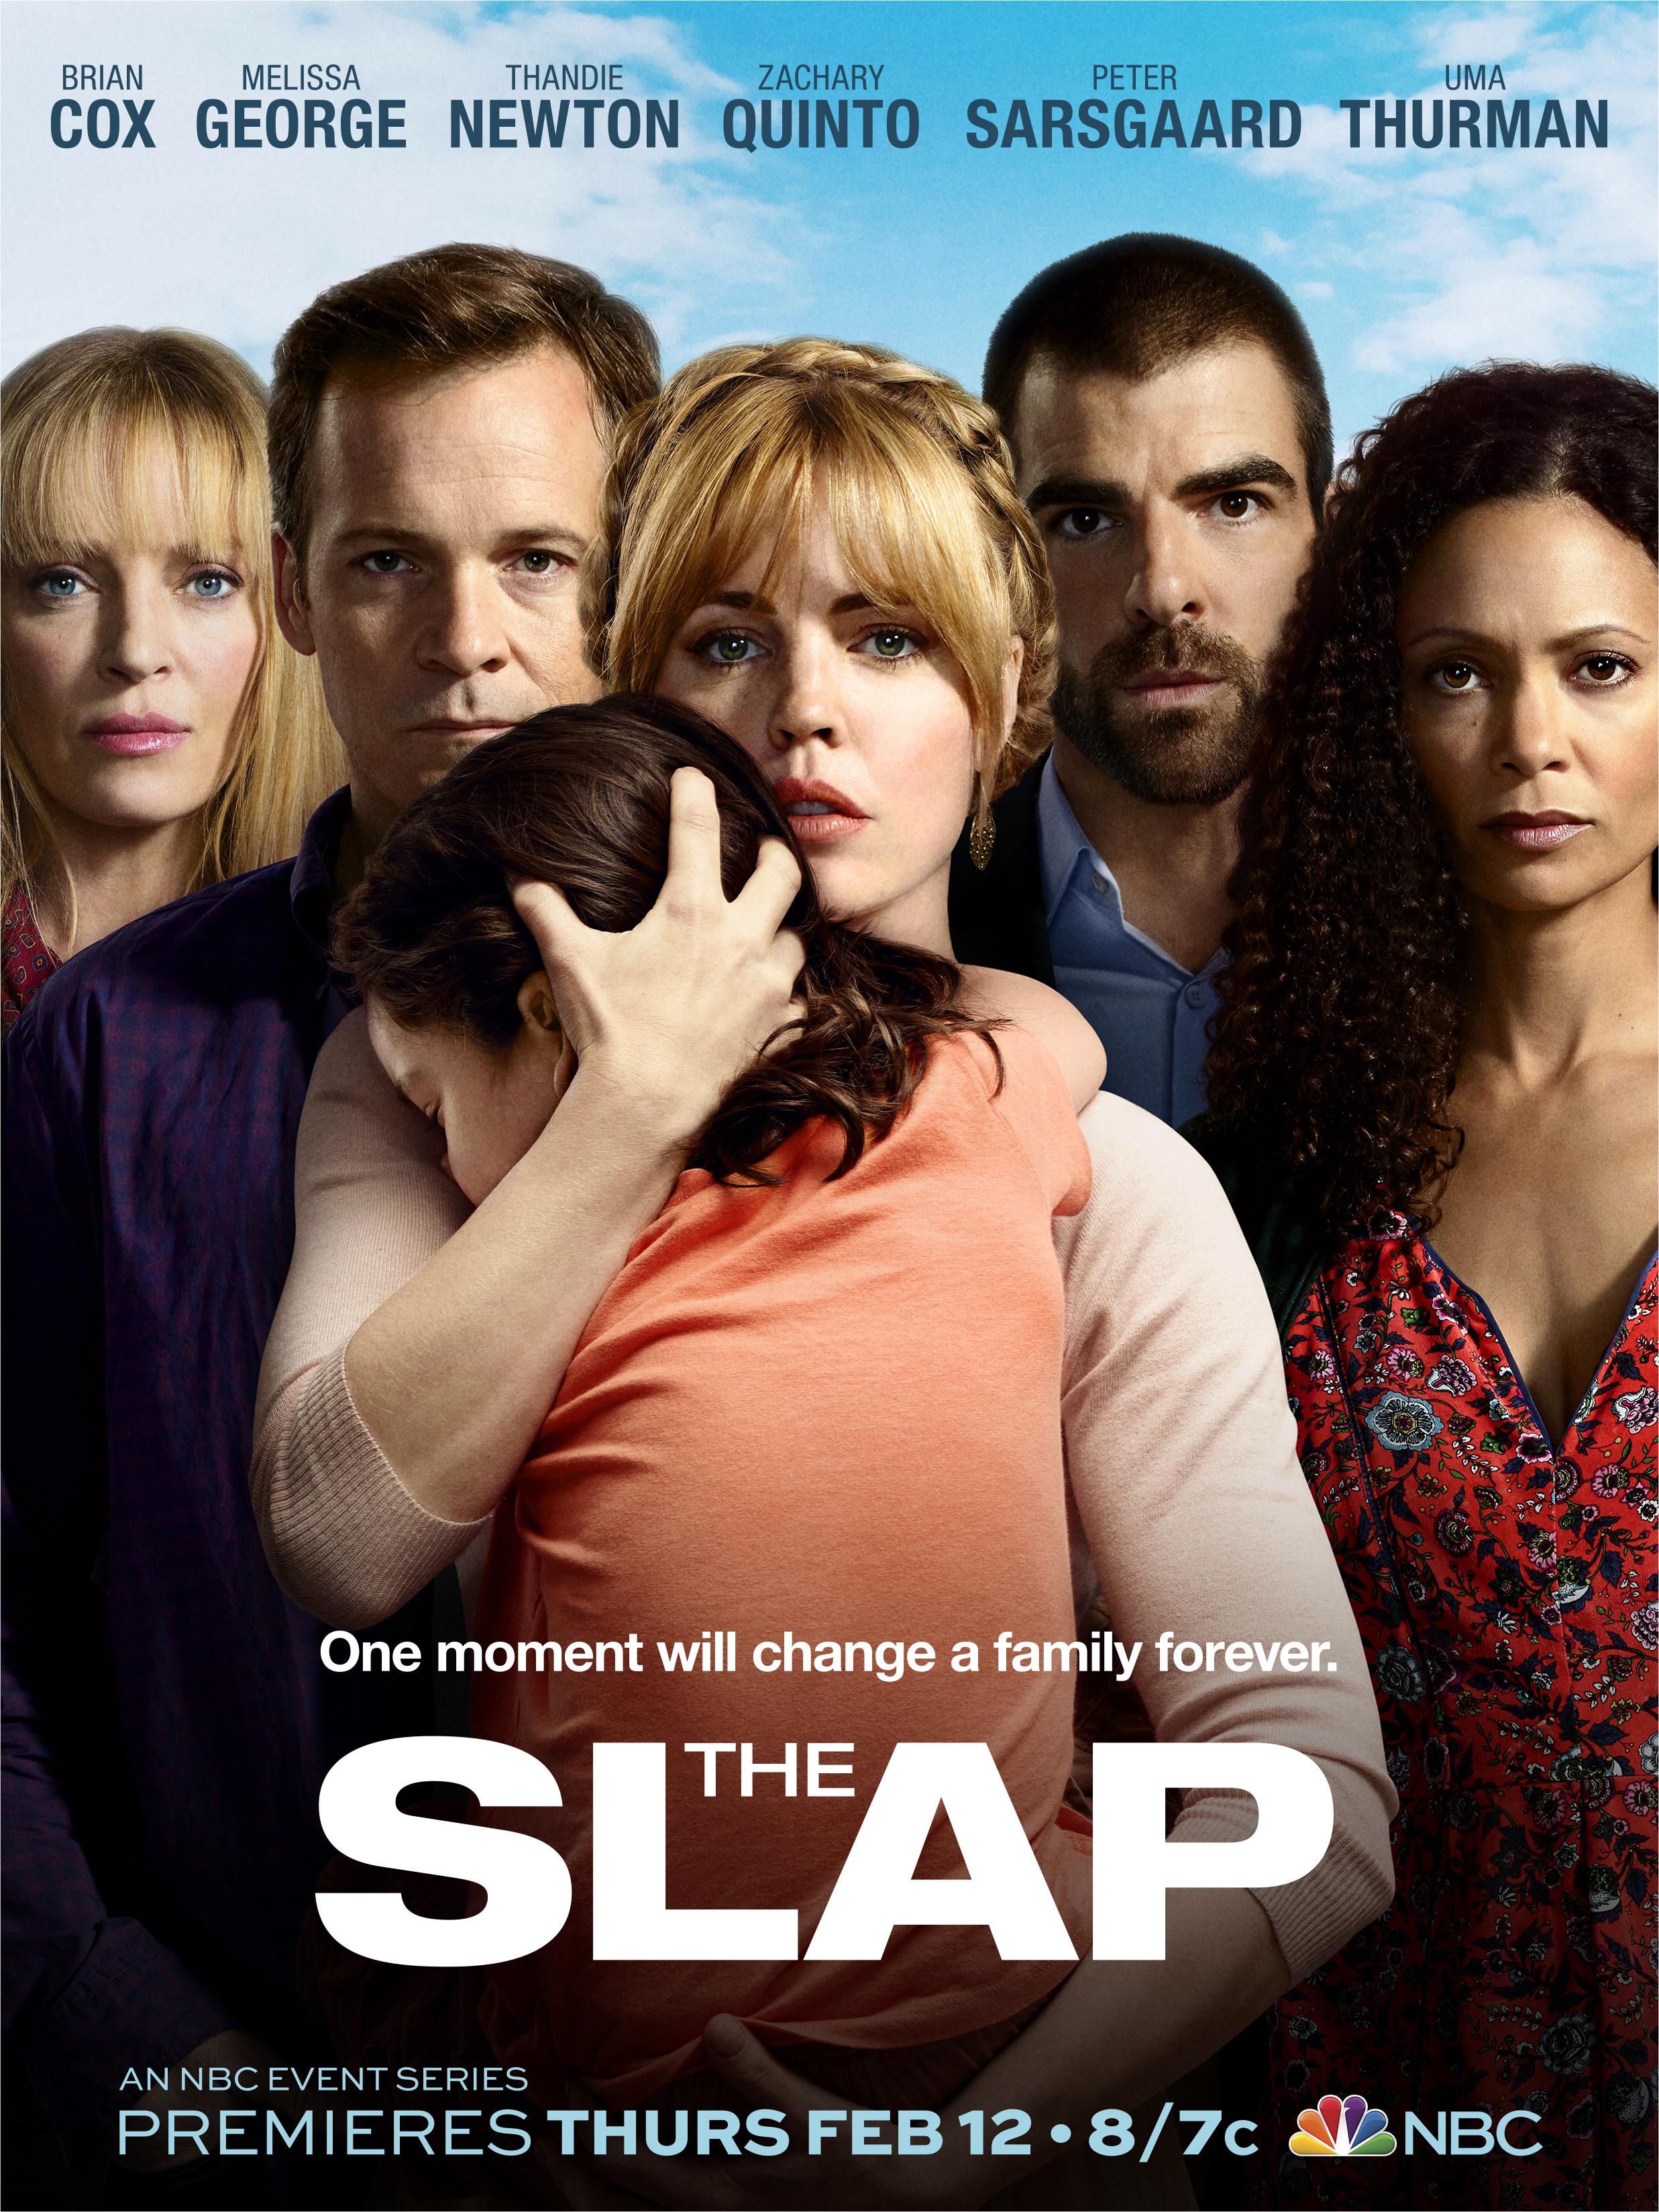 The Slap (TV Series 2015– ) - IMDb